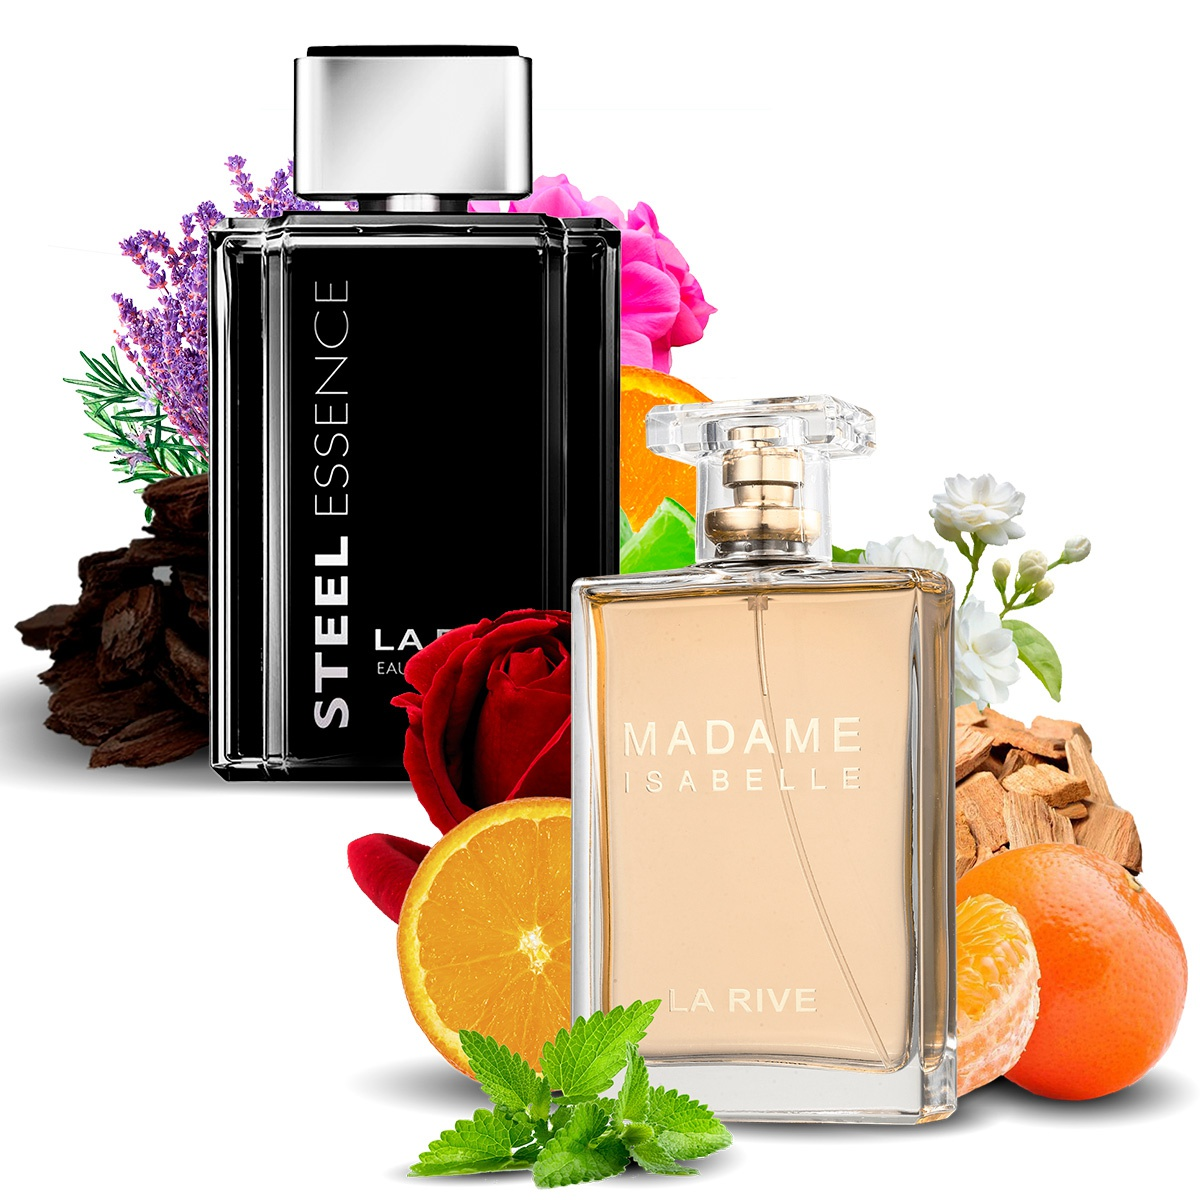 Kit 2 Perfumes, Steel Essence e Madame Isabelle La Rive